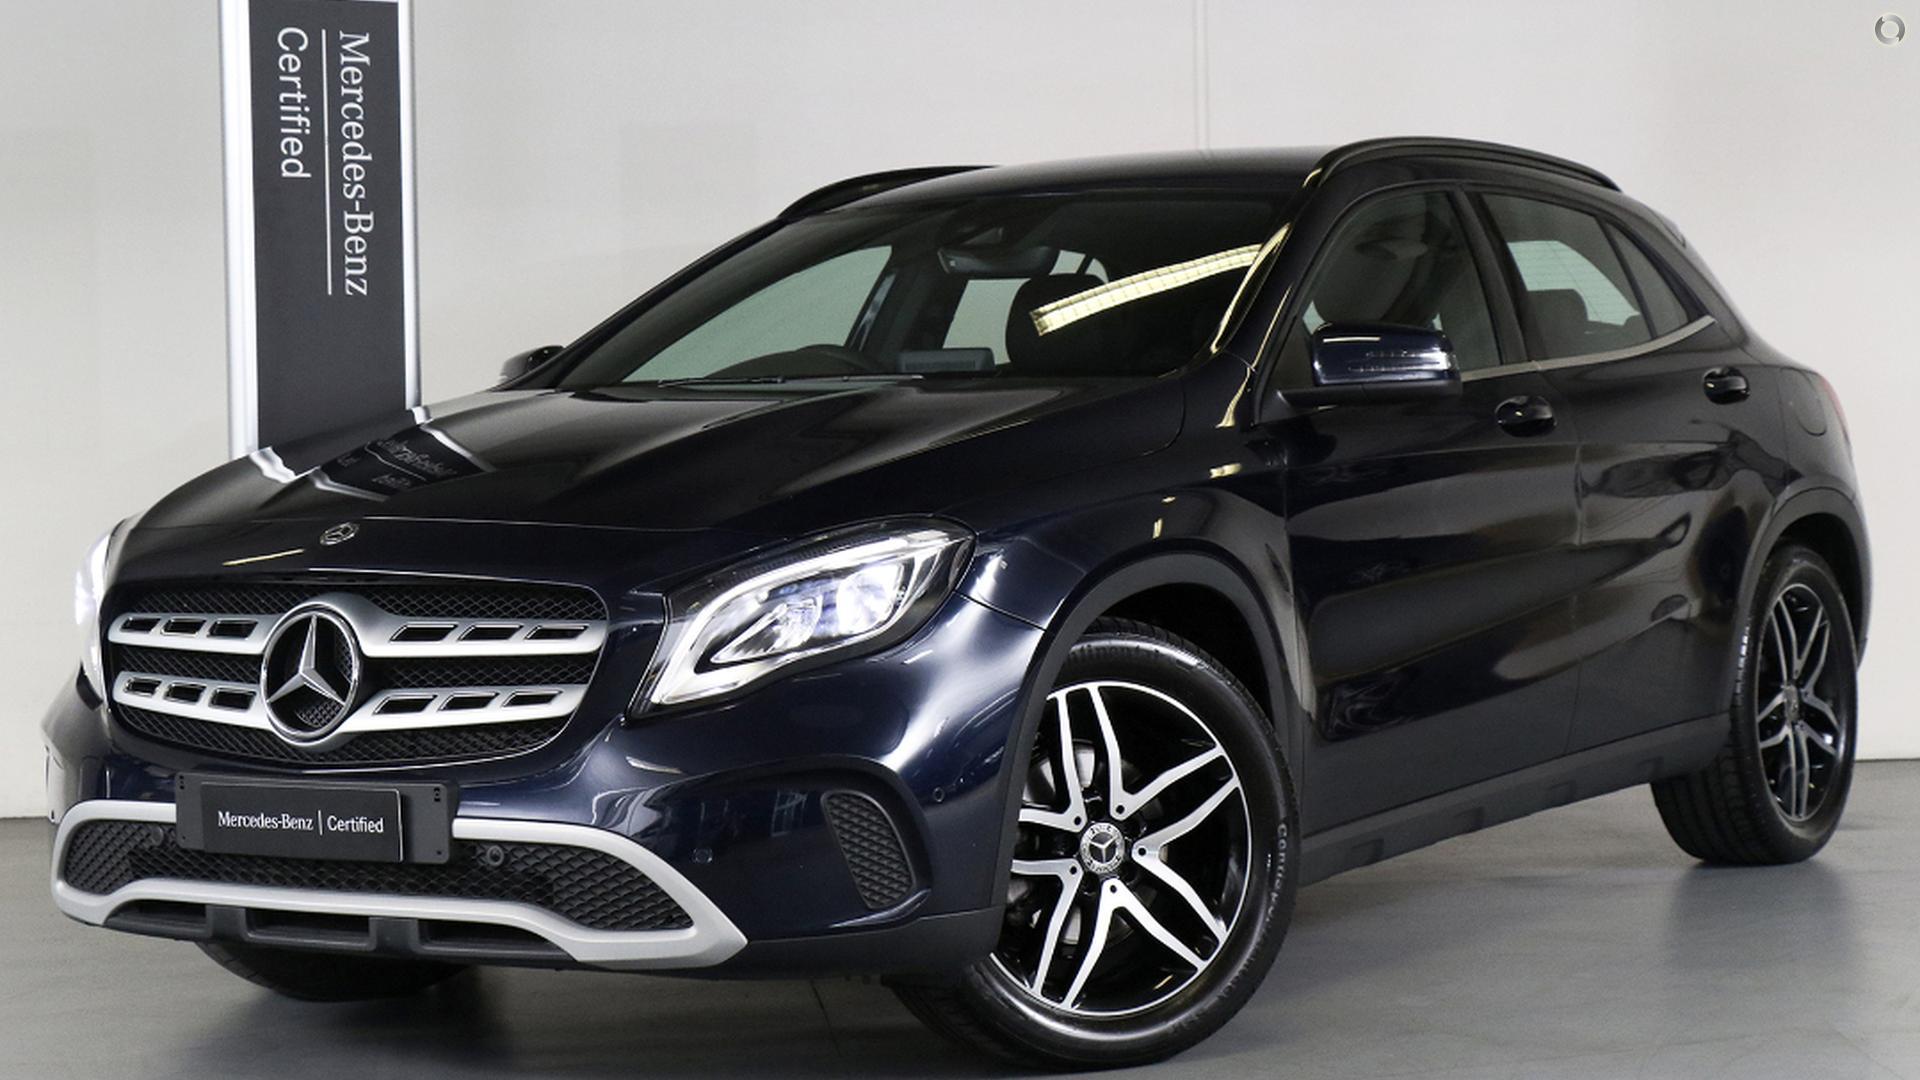 Mercedes benz newcastle nsw